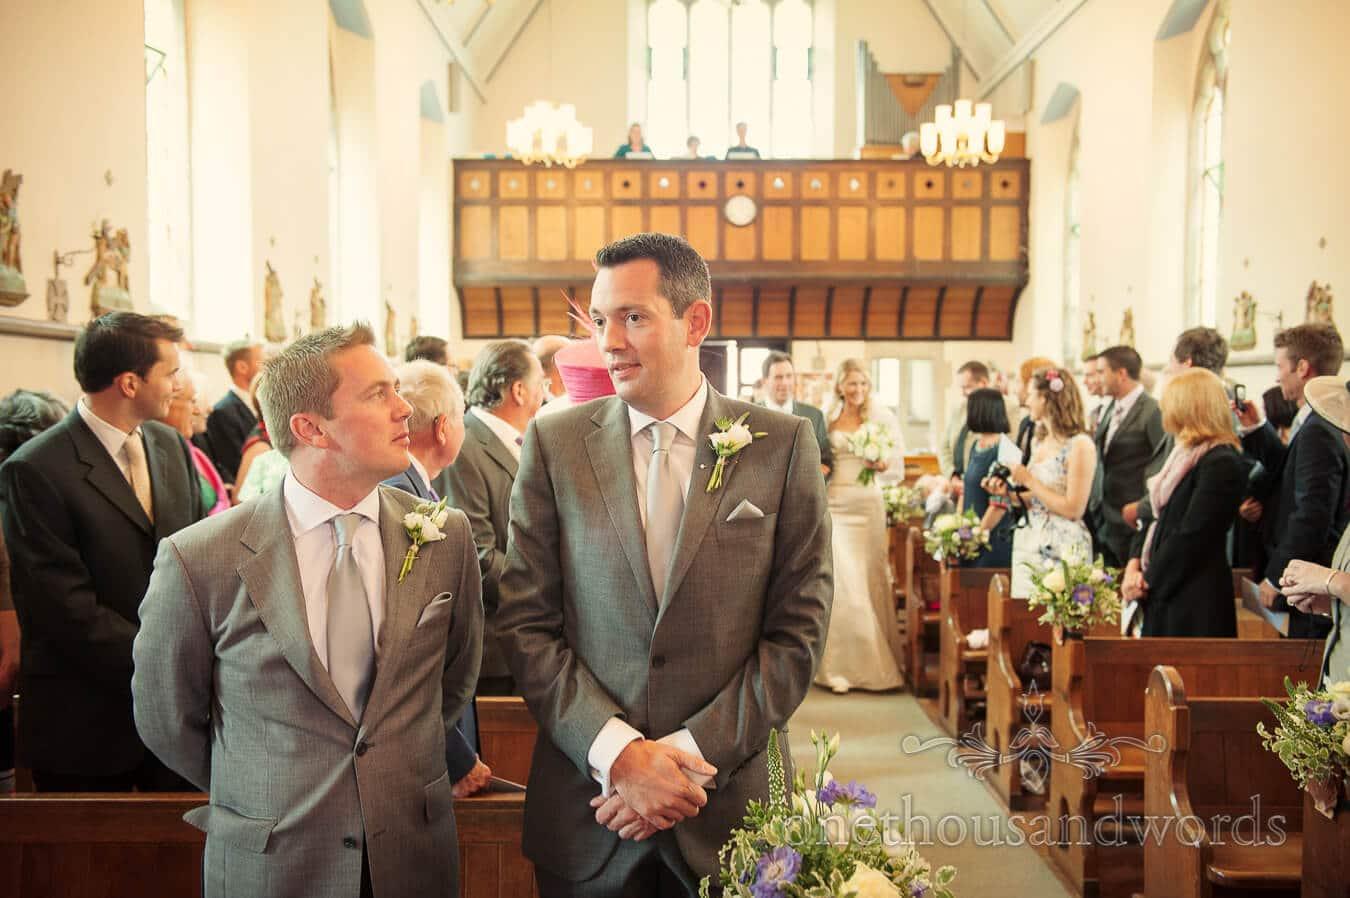 Grrom waits as bride walks down church aisle at Swanage wedding ceremony